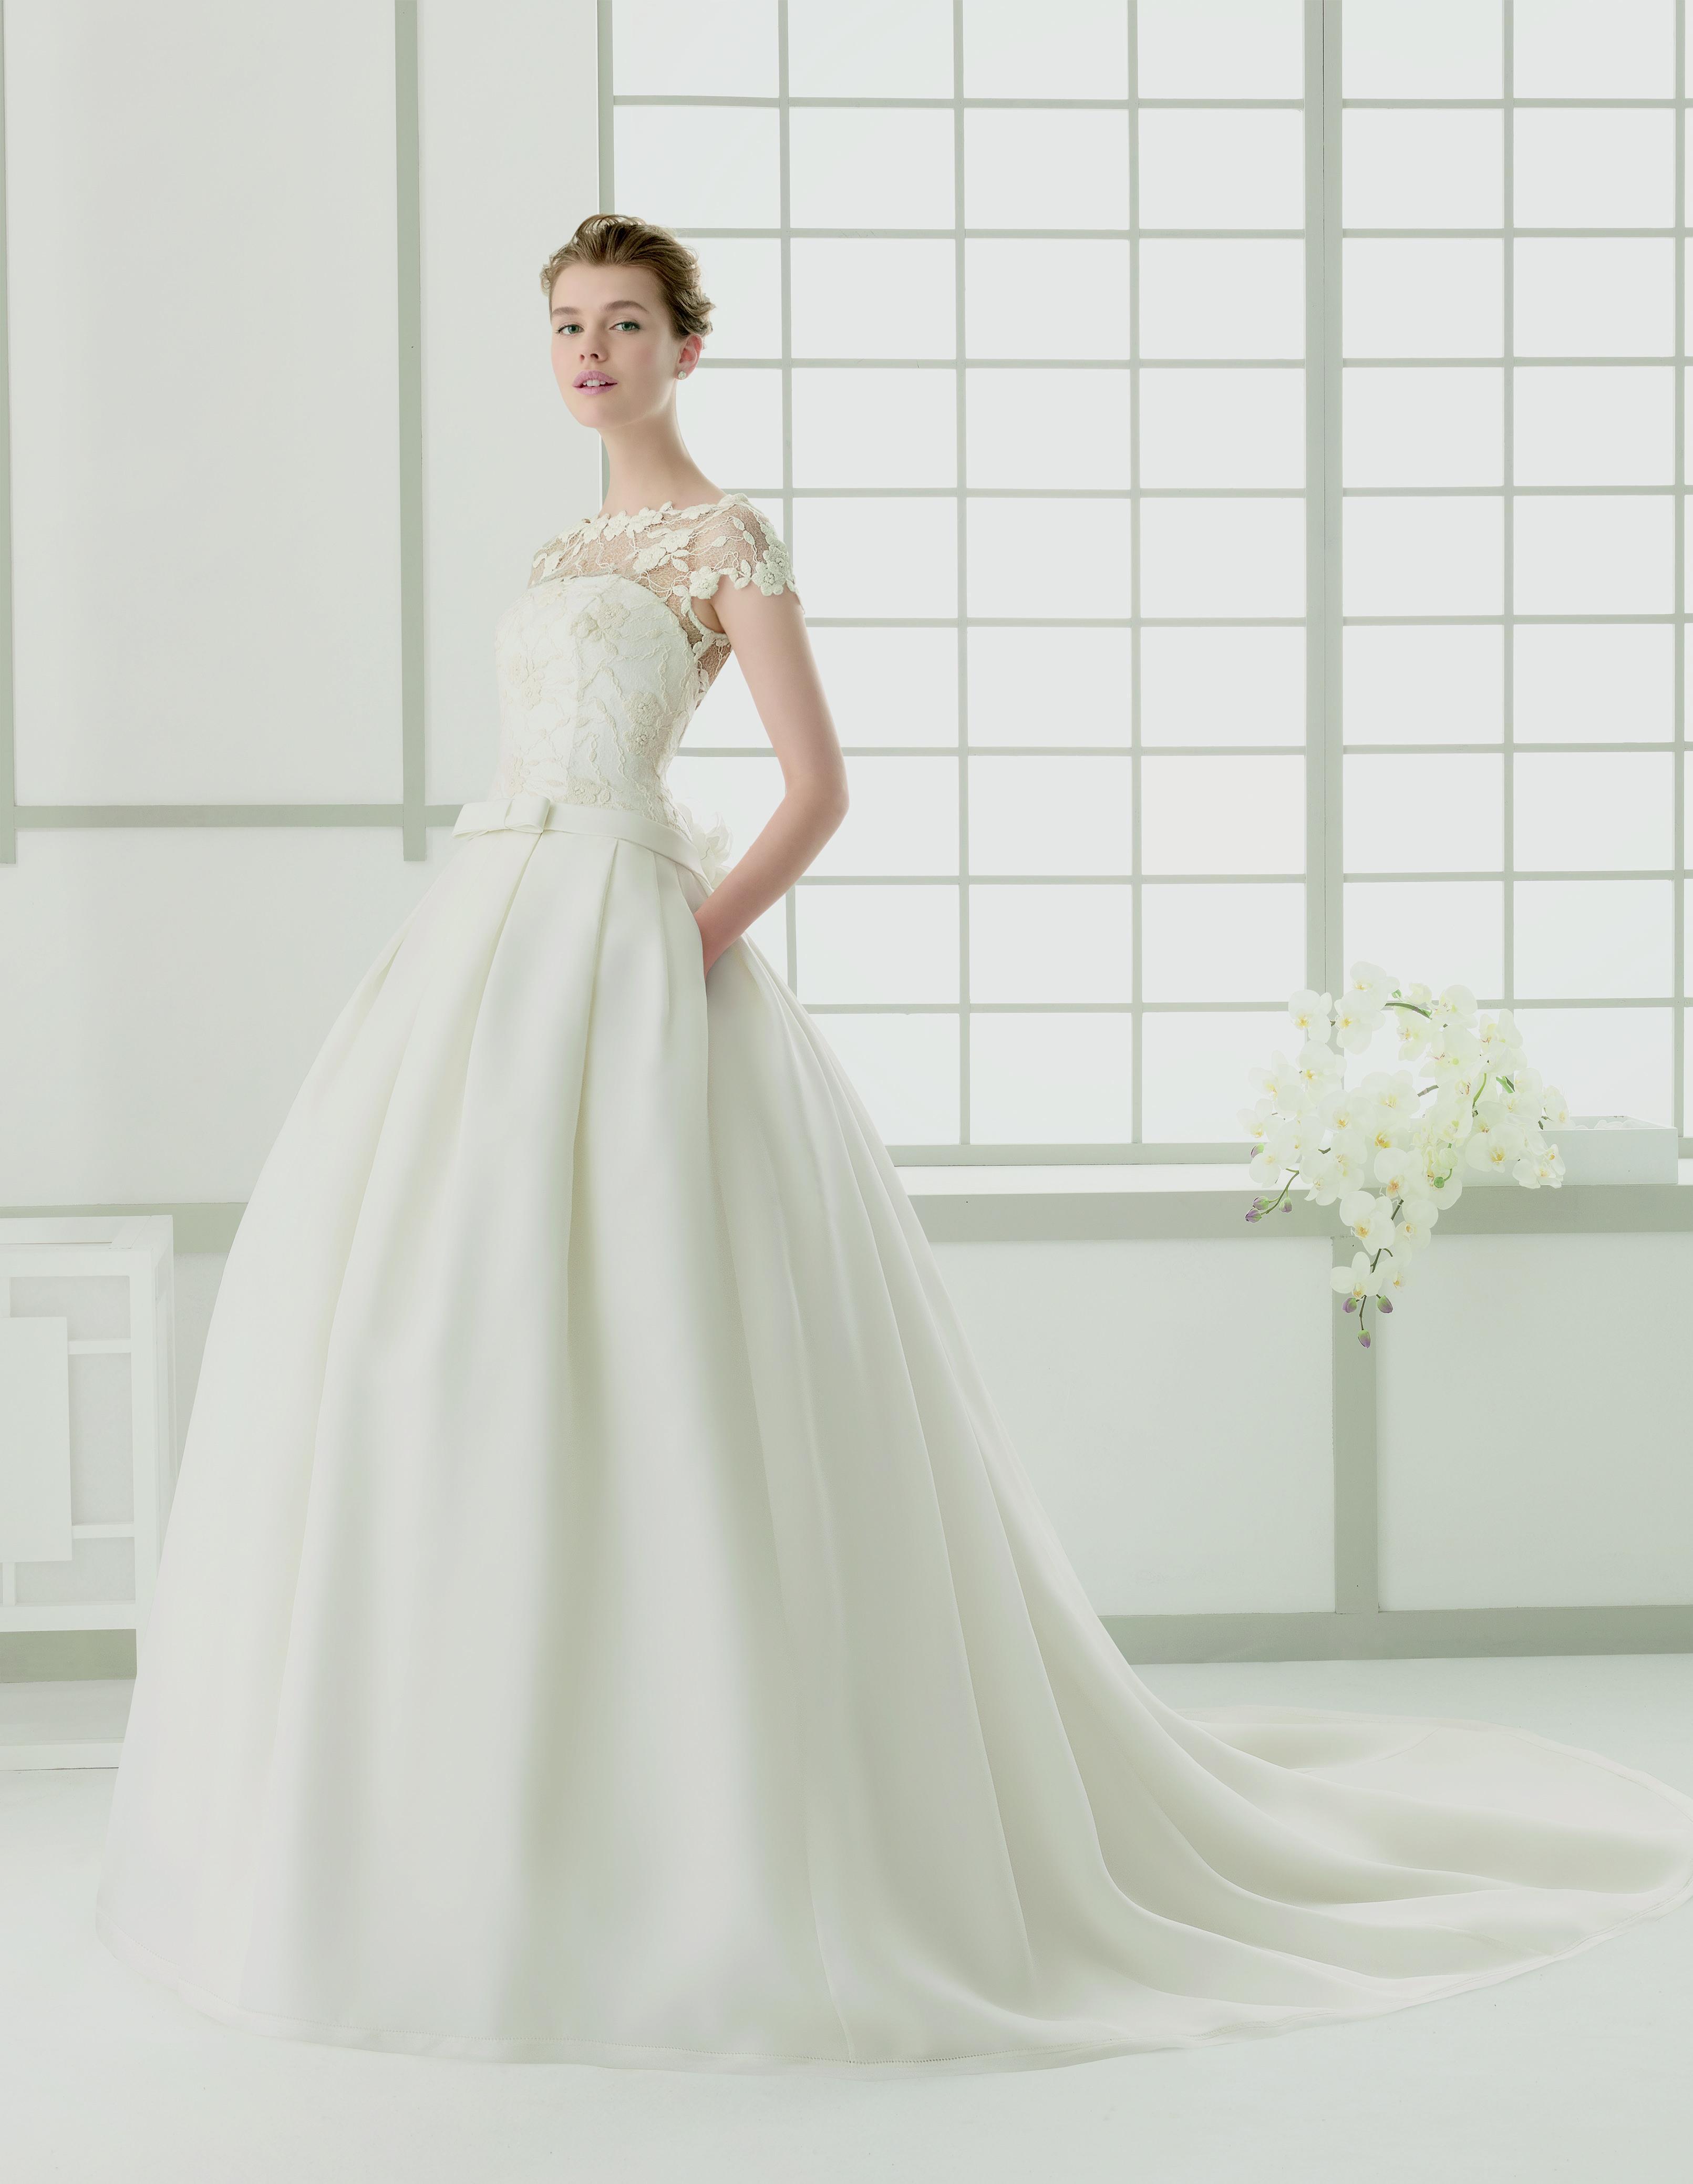 Top trends at Harrogate - Business - Bridal Buyer